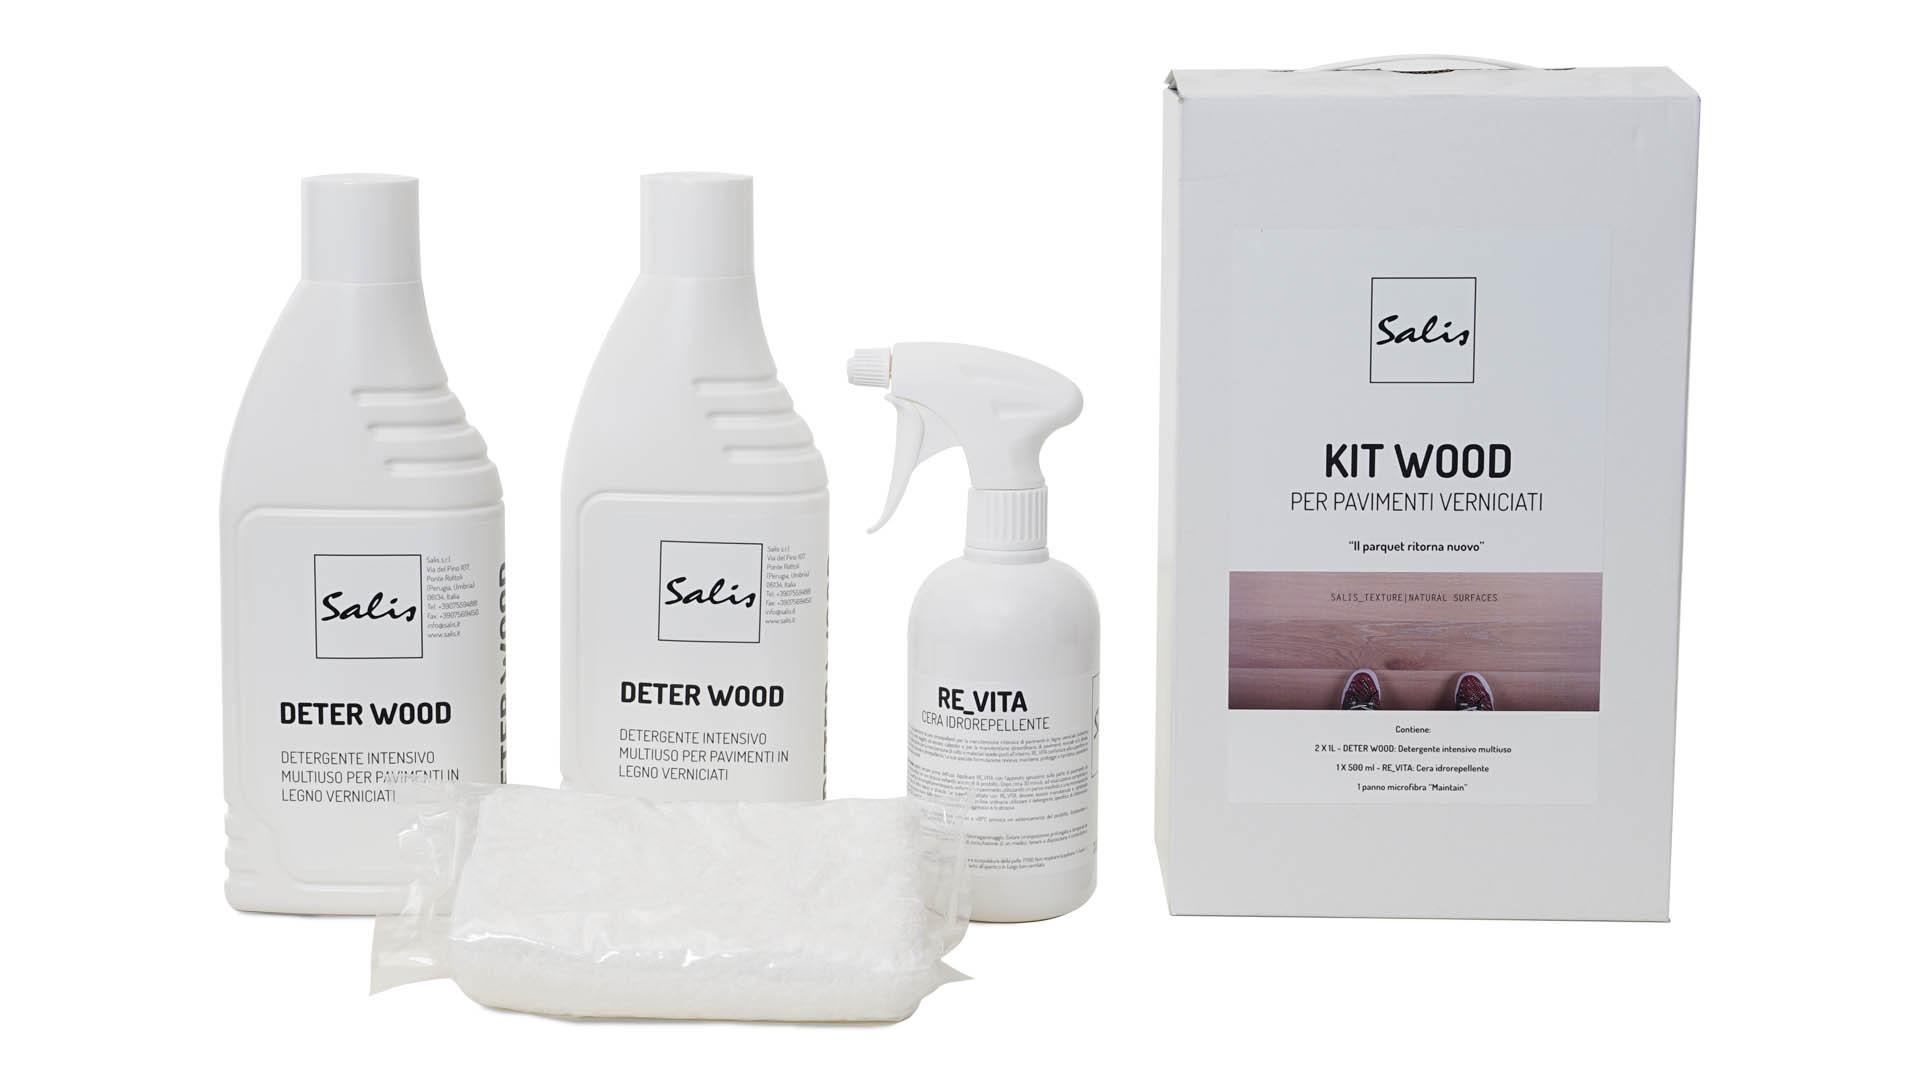 lavare-parquet-verniciato-kit-wood-1